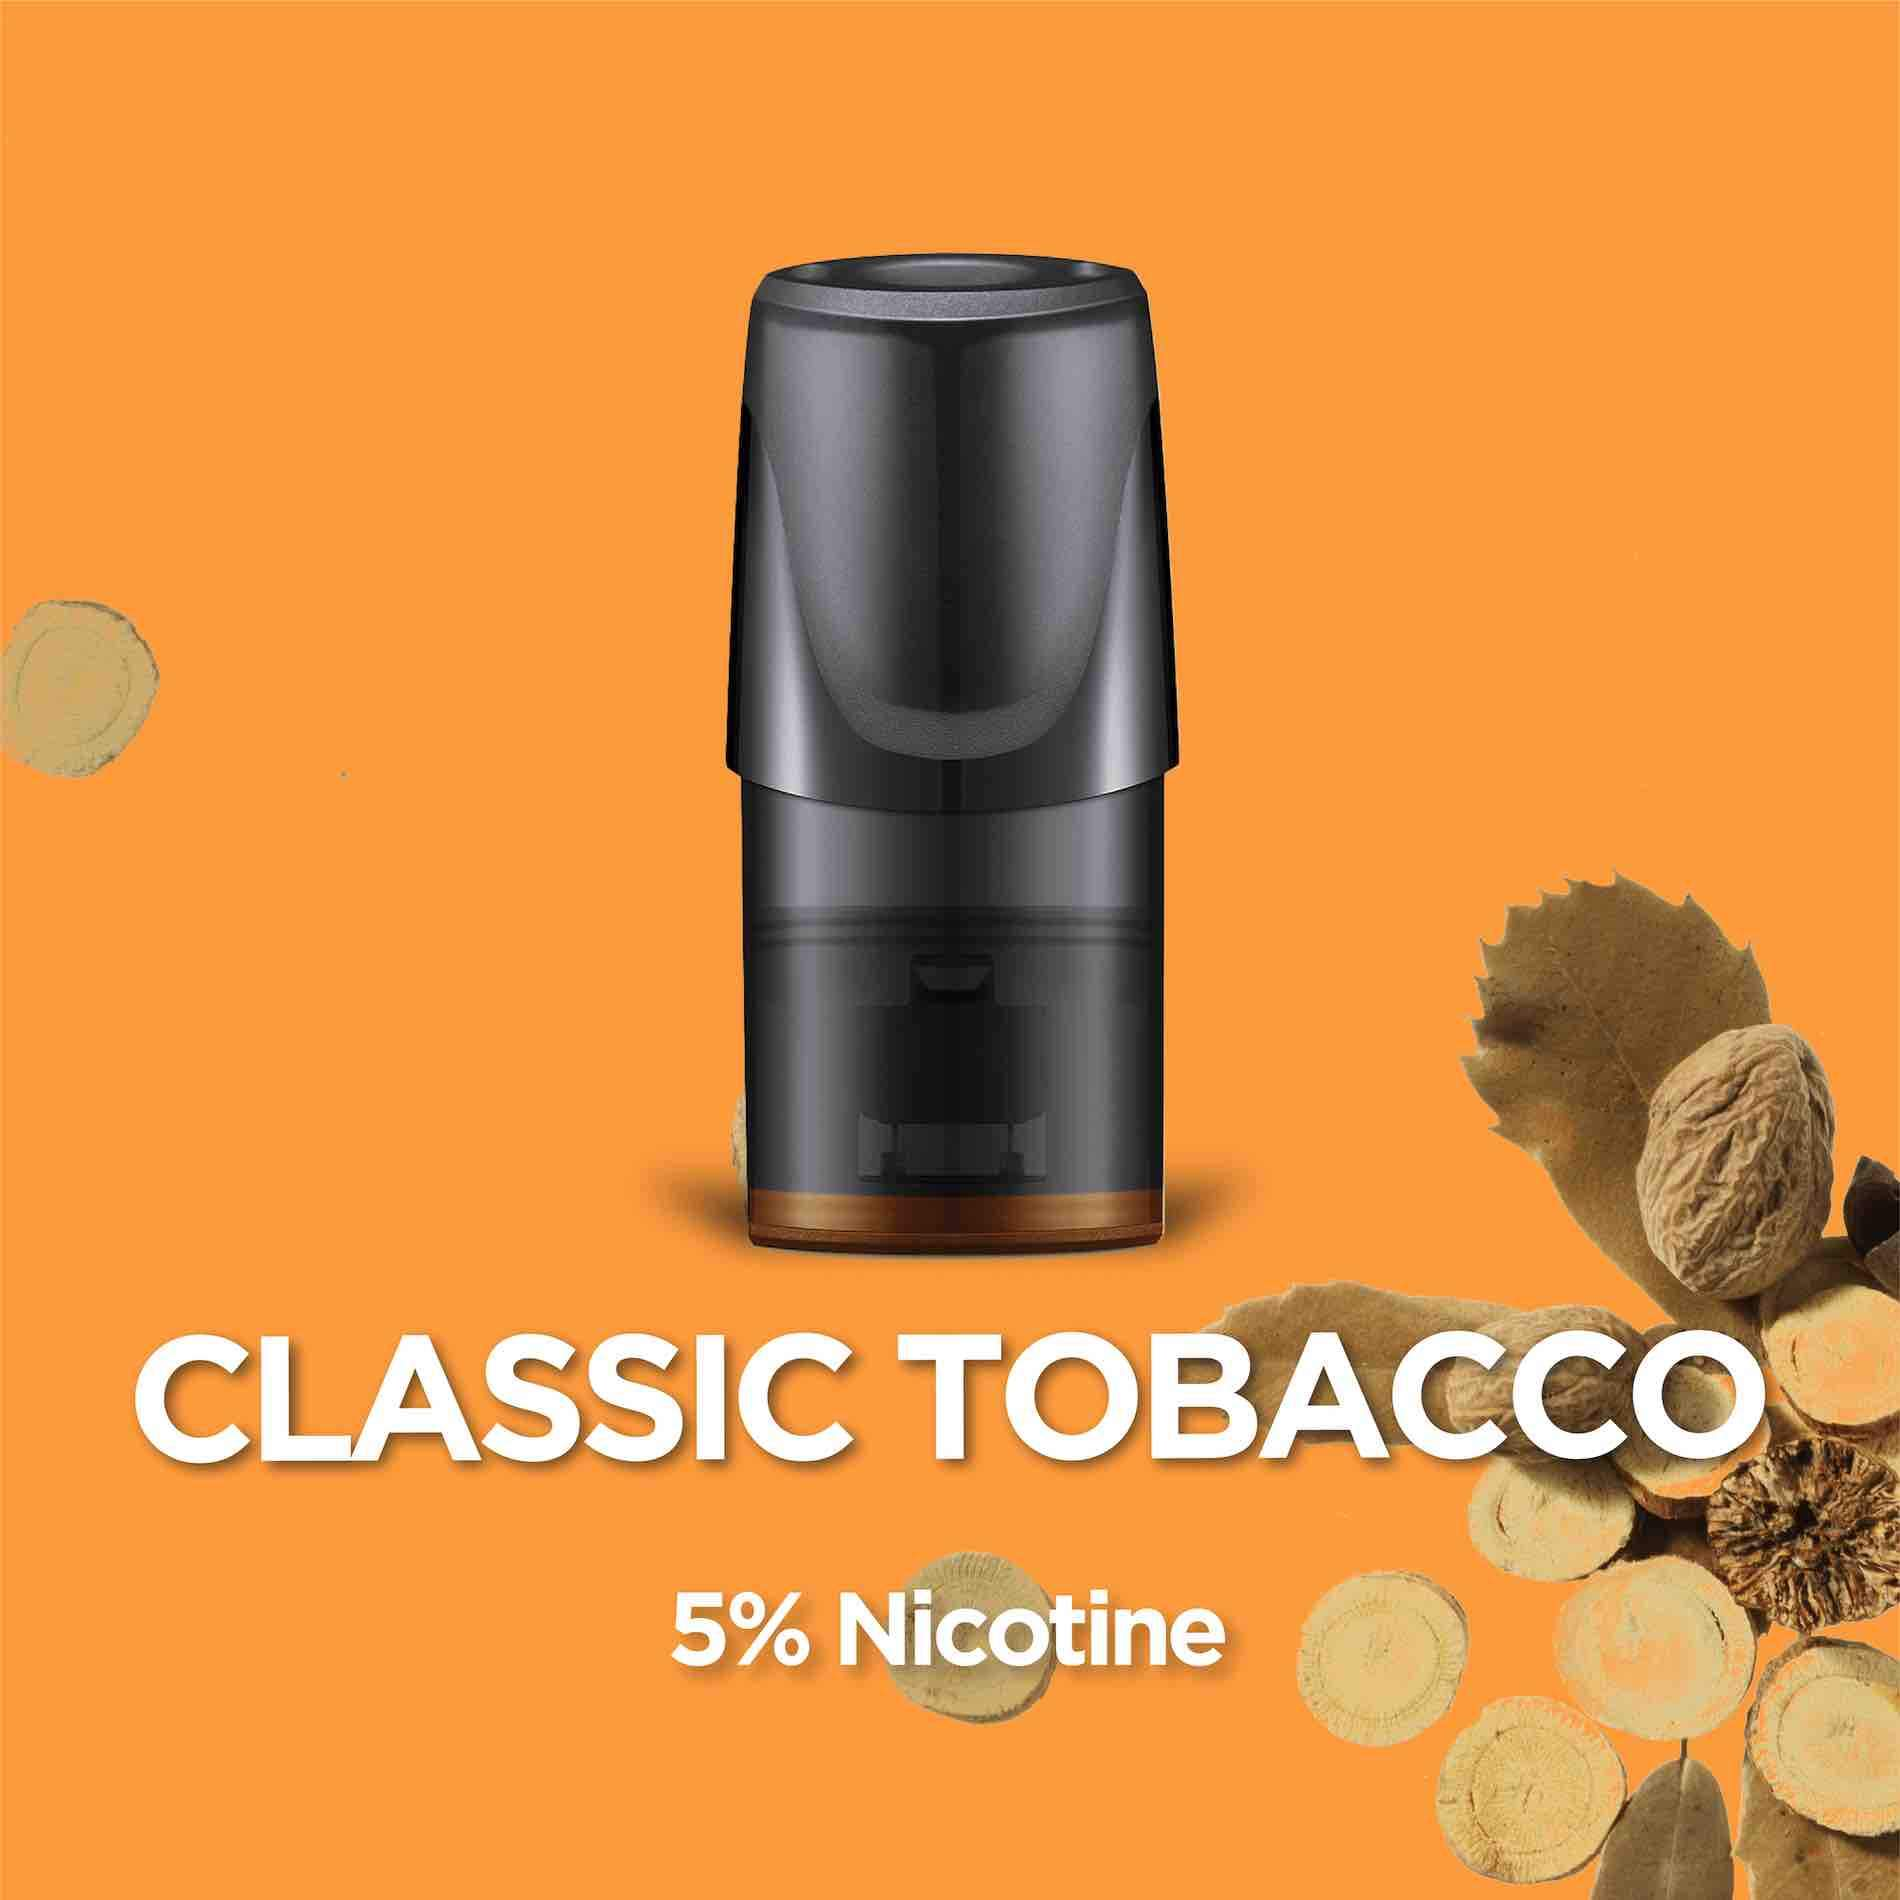 Classic Tobacco by Relx